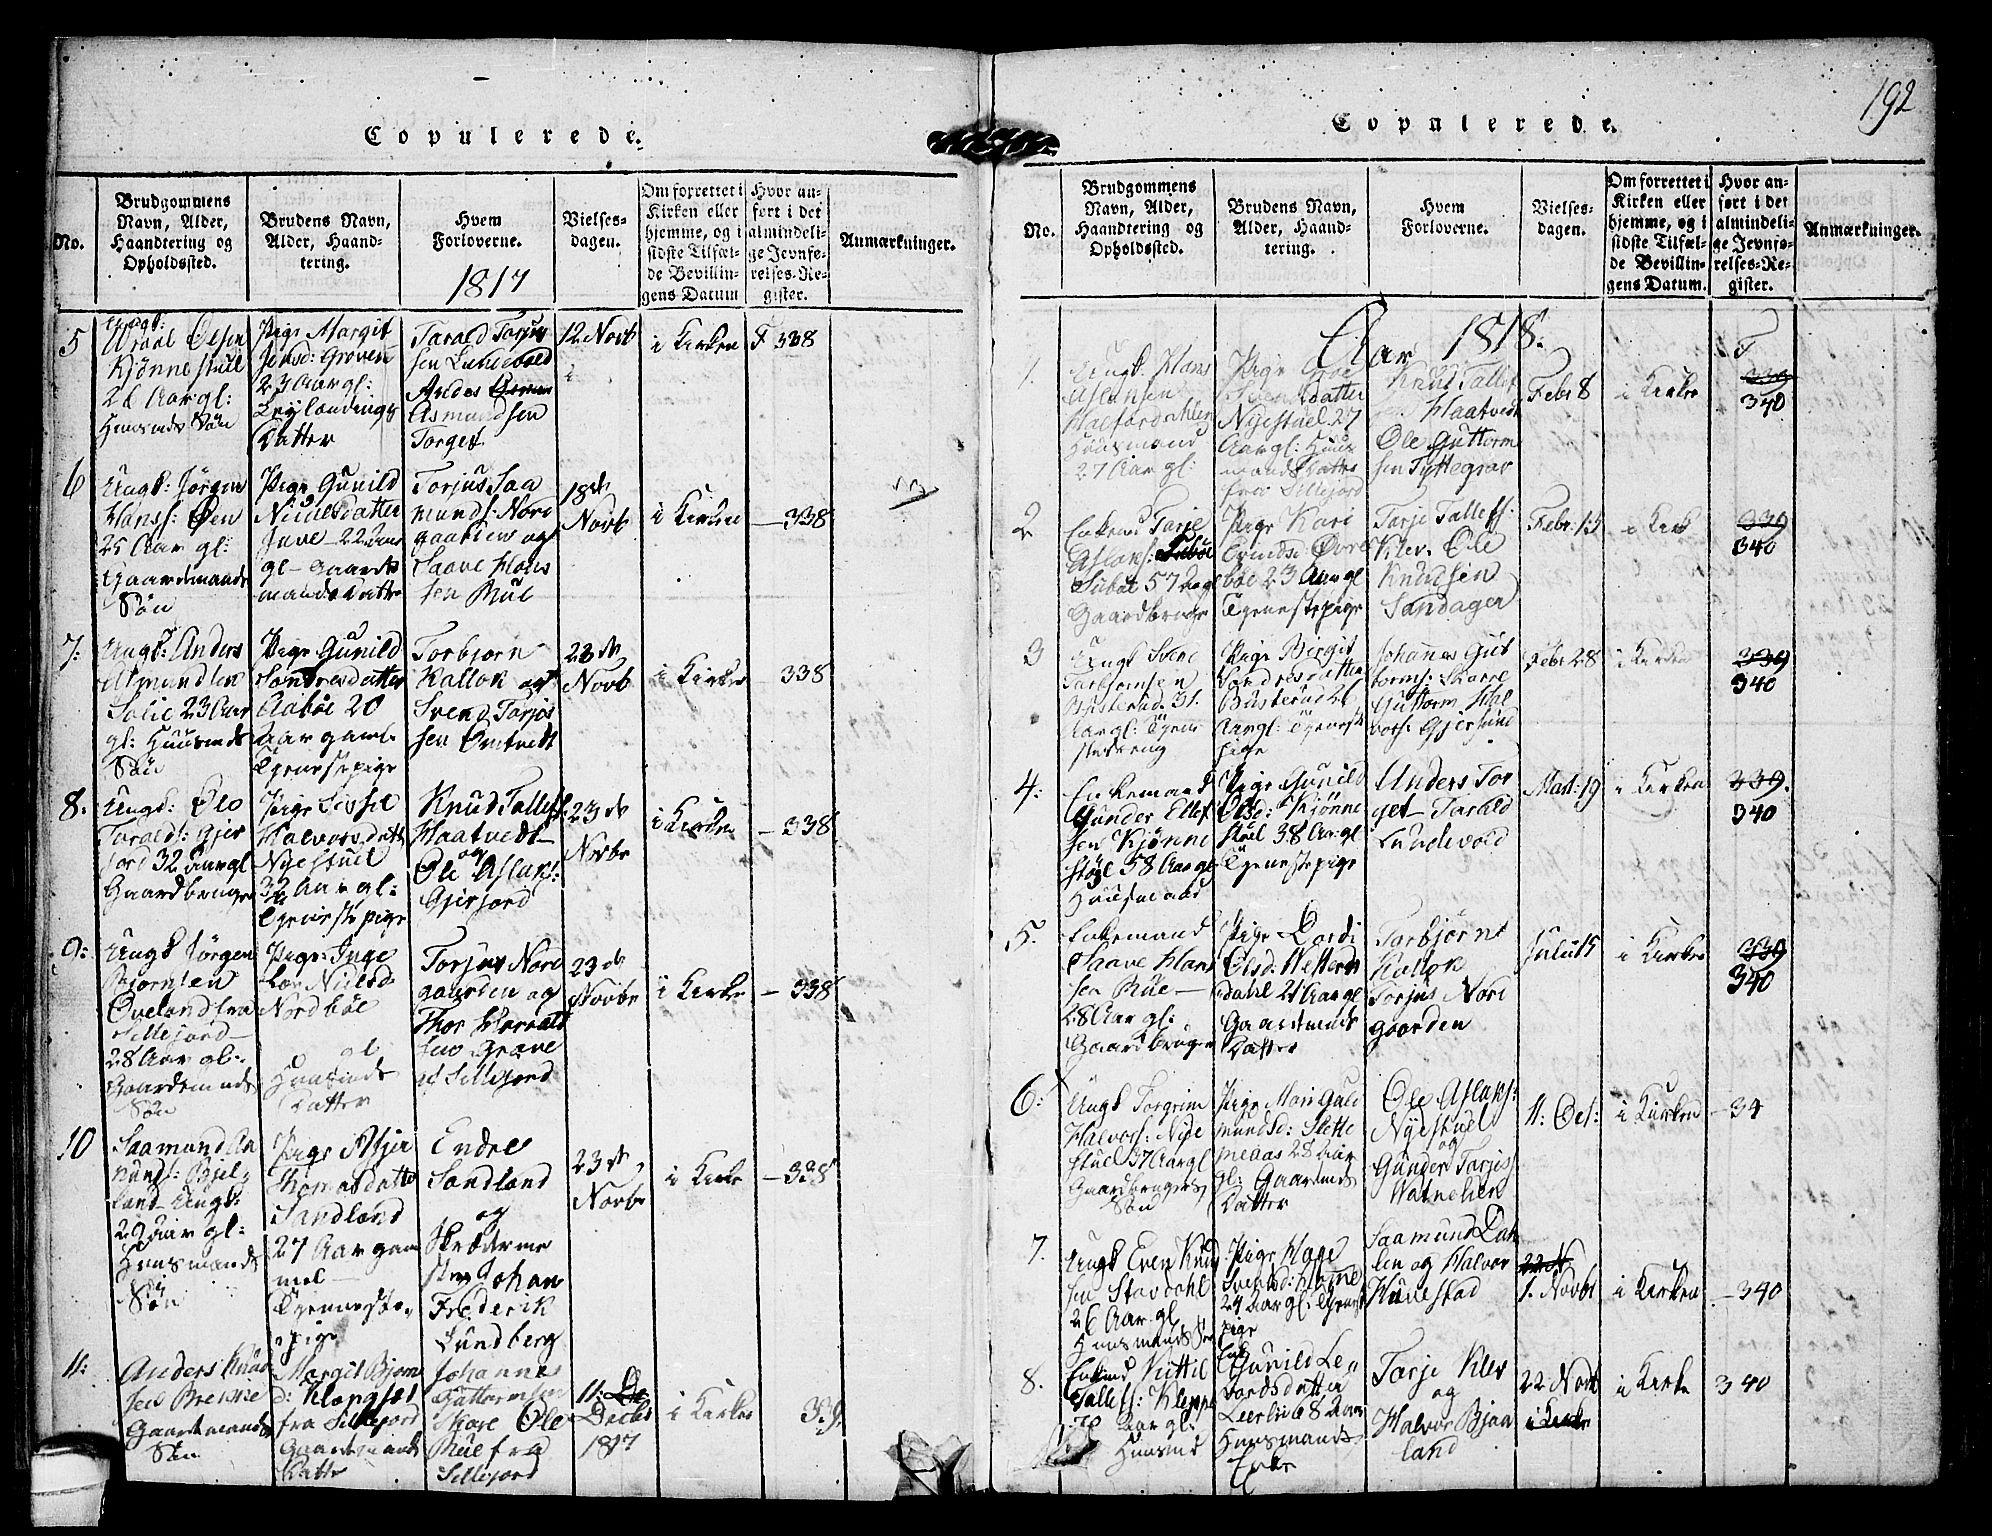 SAKO, Kviteseid kirkebøker, F/Fb/L0001: Ministerialbok nr. II 1, 1815-1836, s. 192